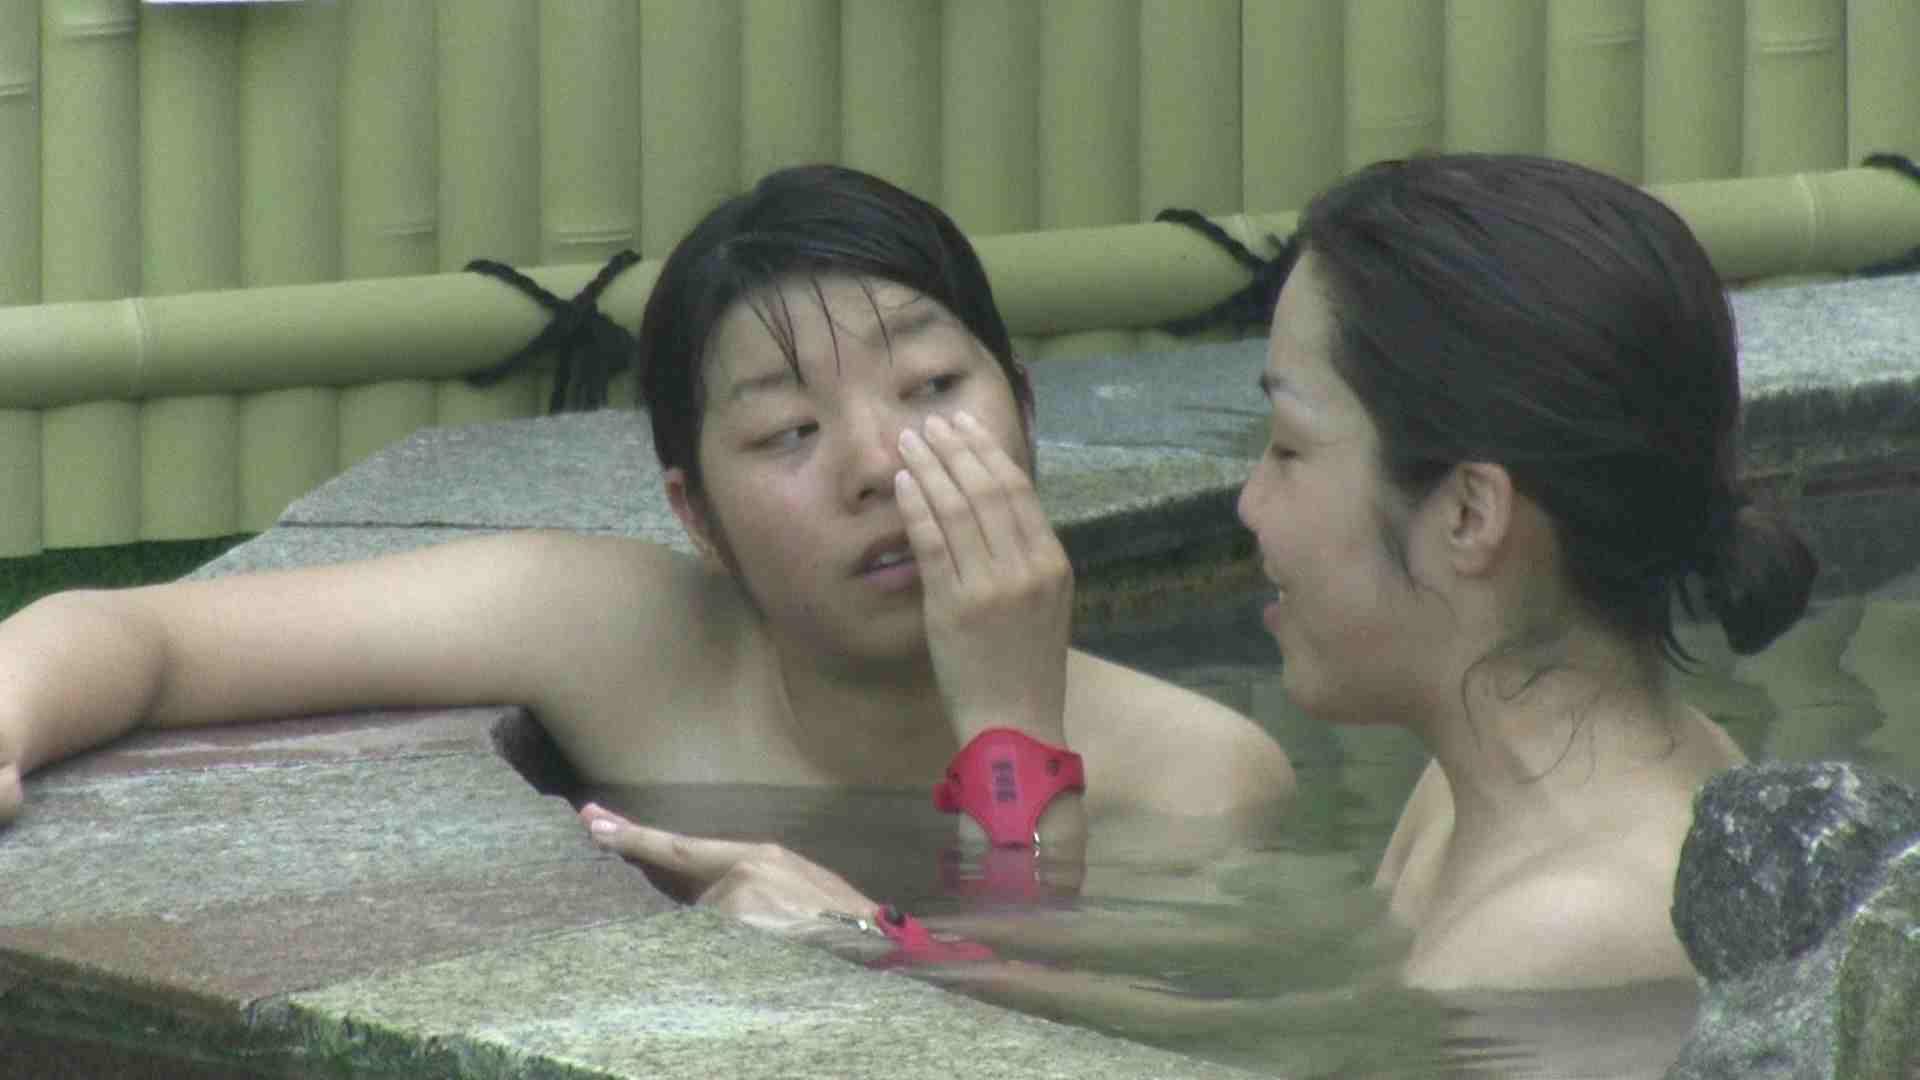 Aquaな露天風呂Vol.182 露天 | OLセックス  80画像 43